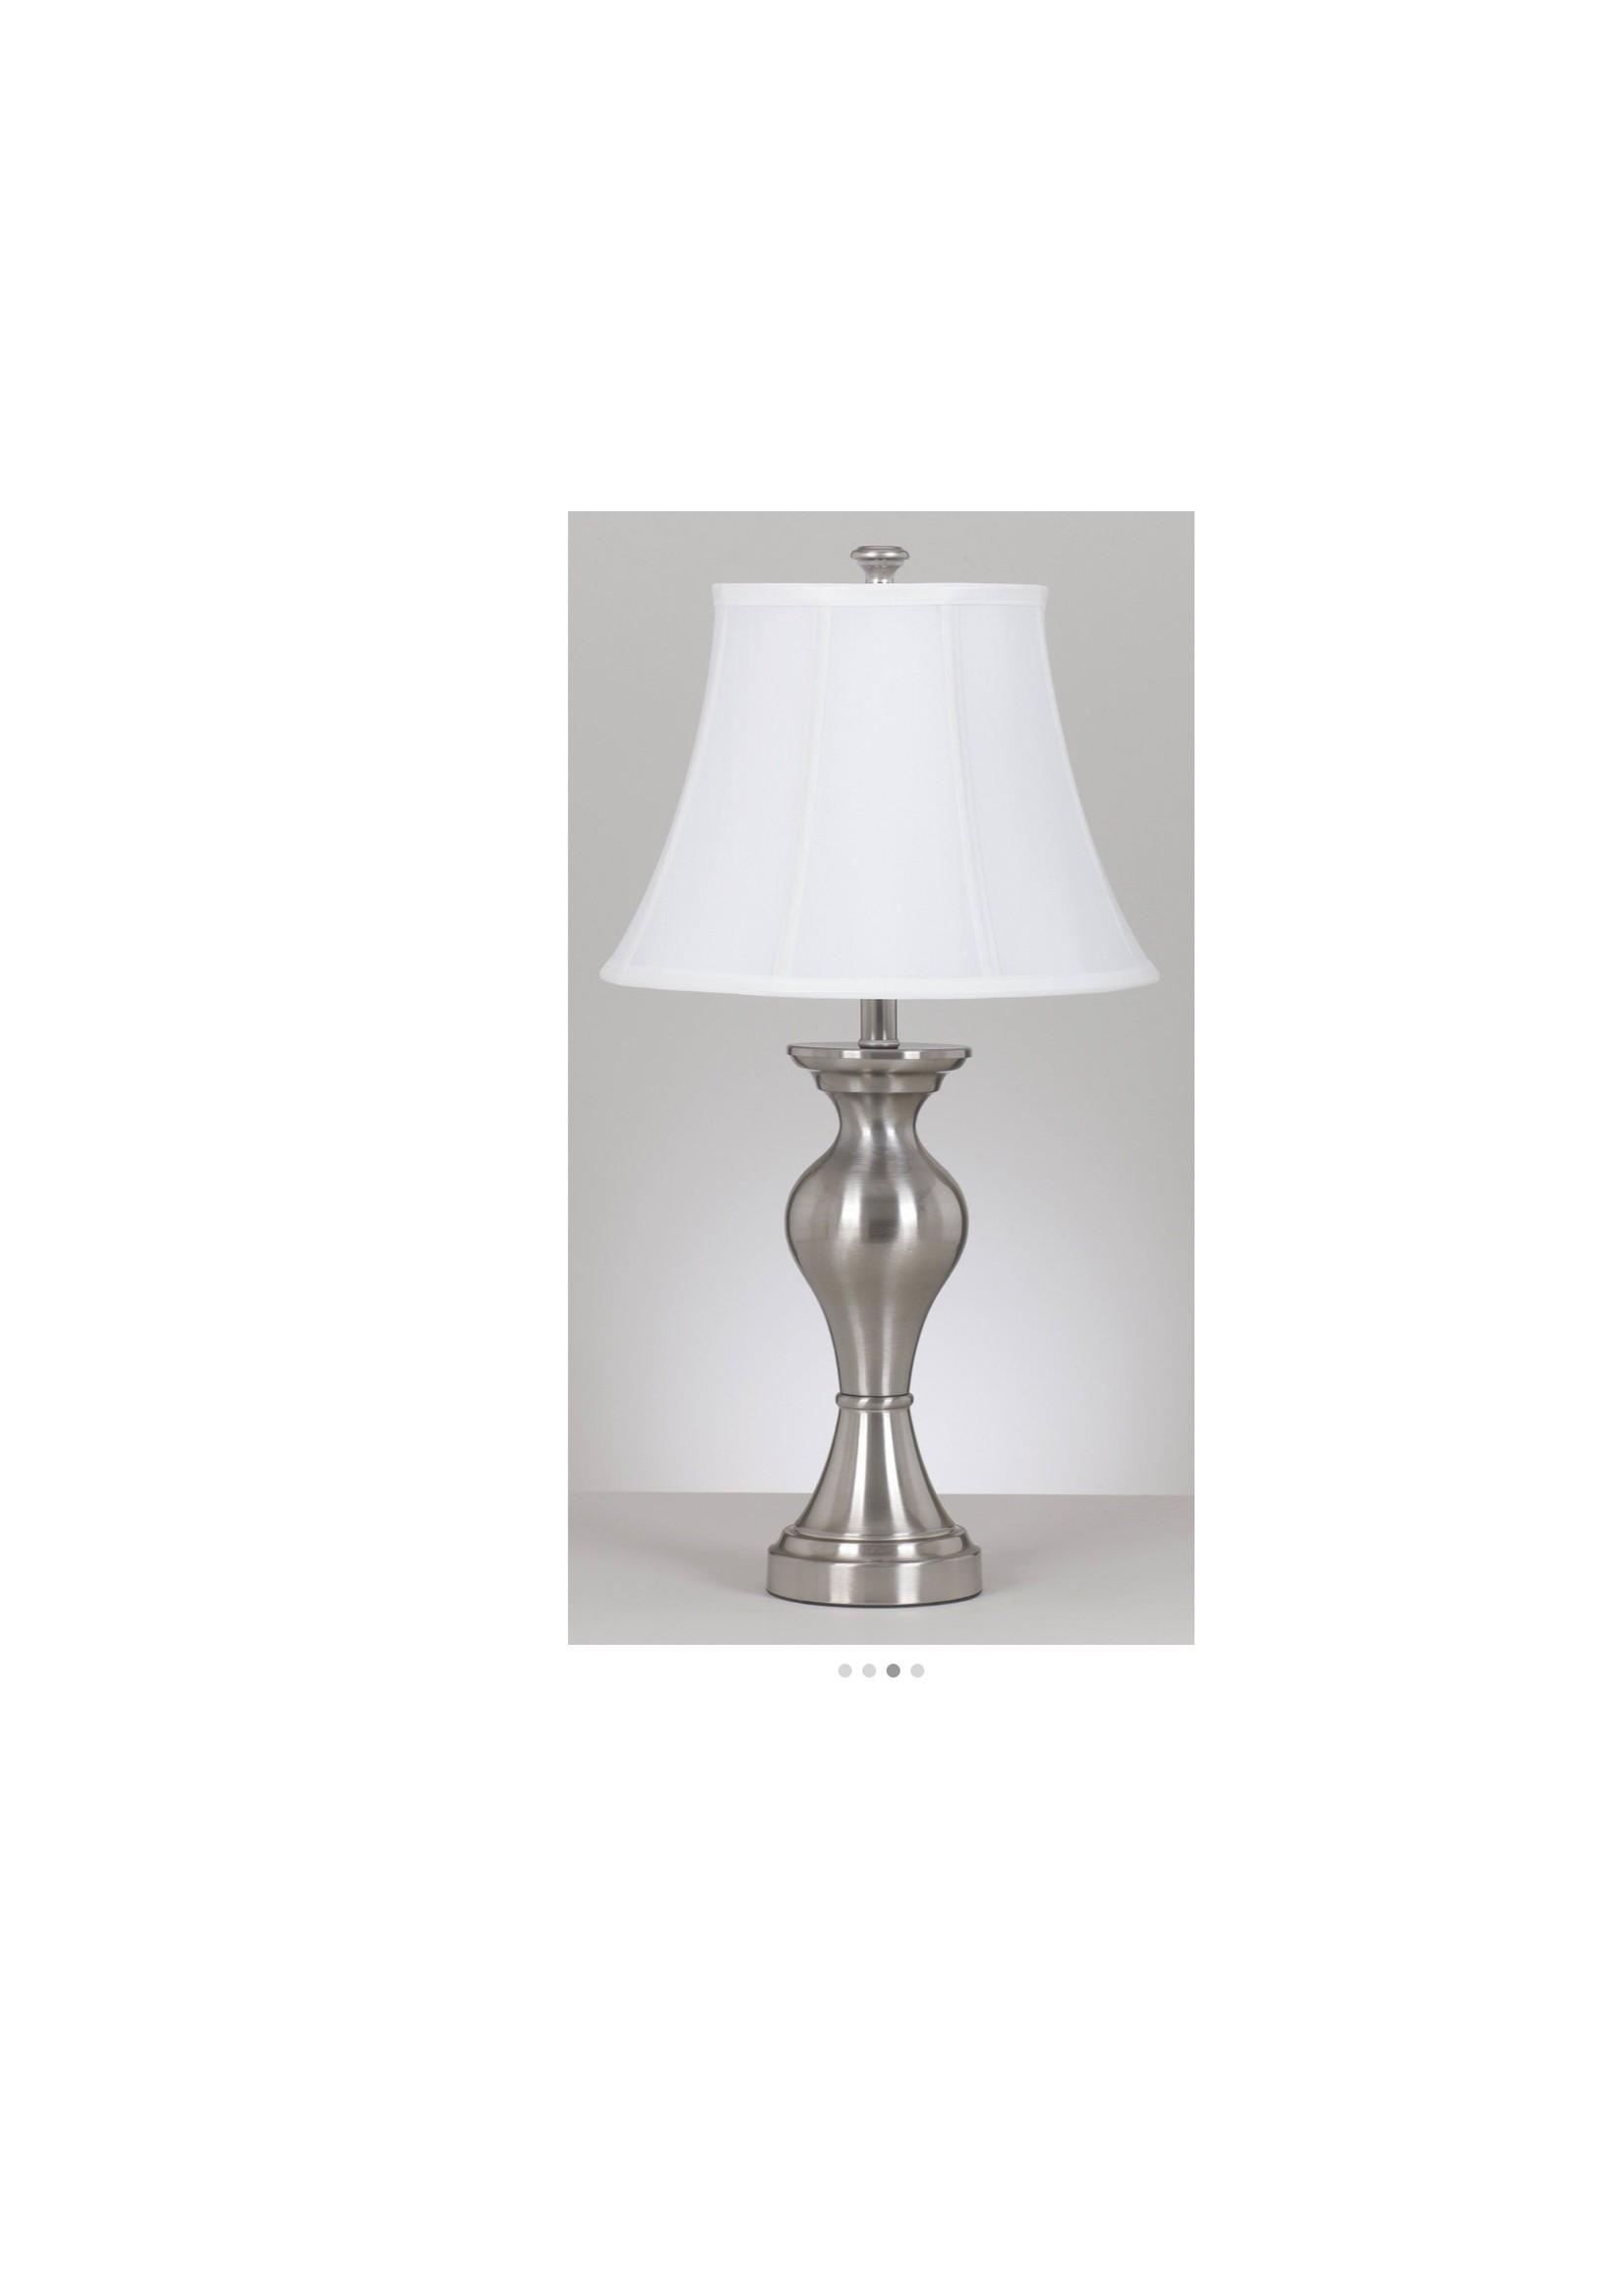 ASHLEY RISHONA TABLE LAMP IN SILVER